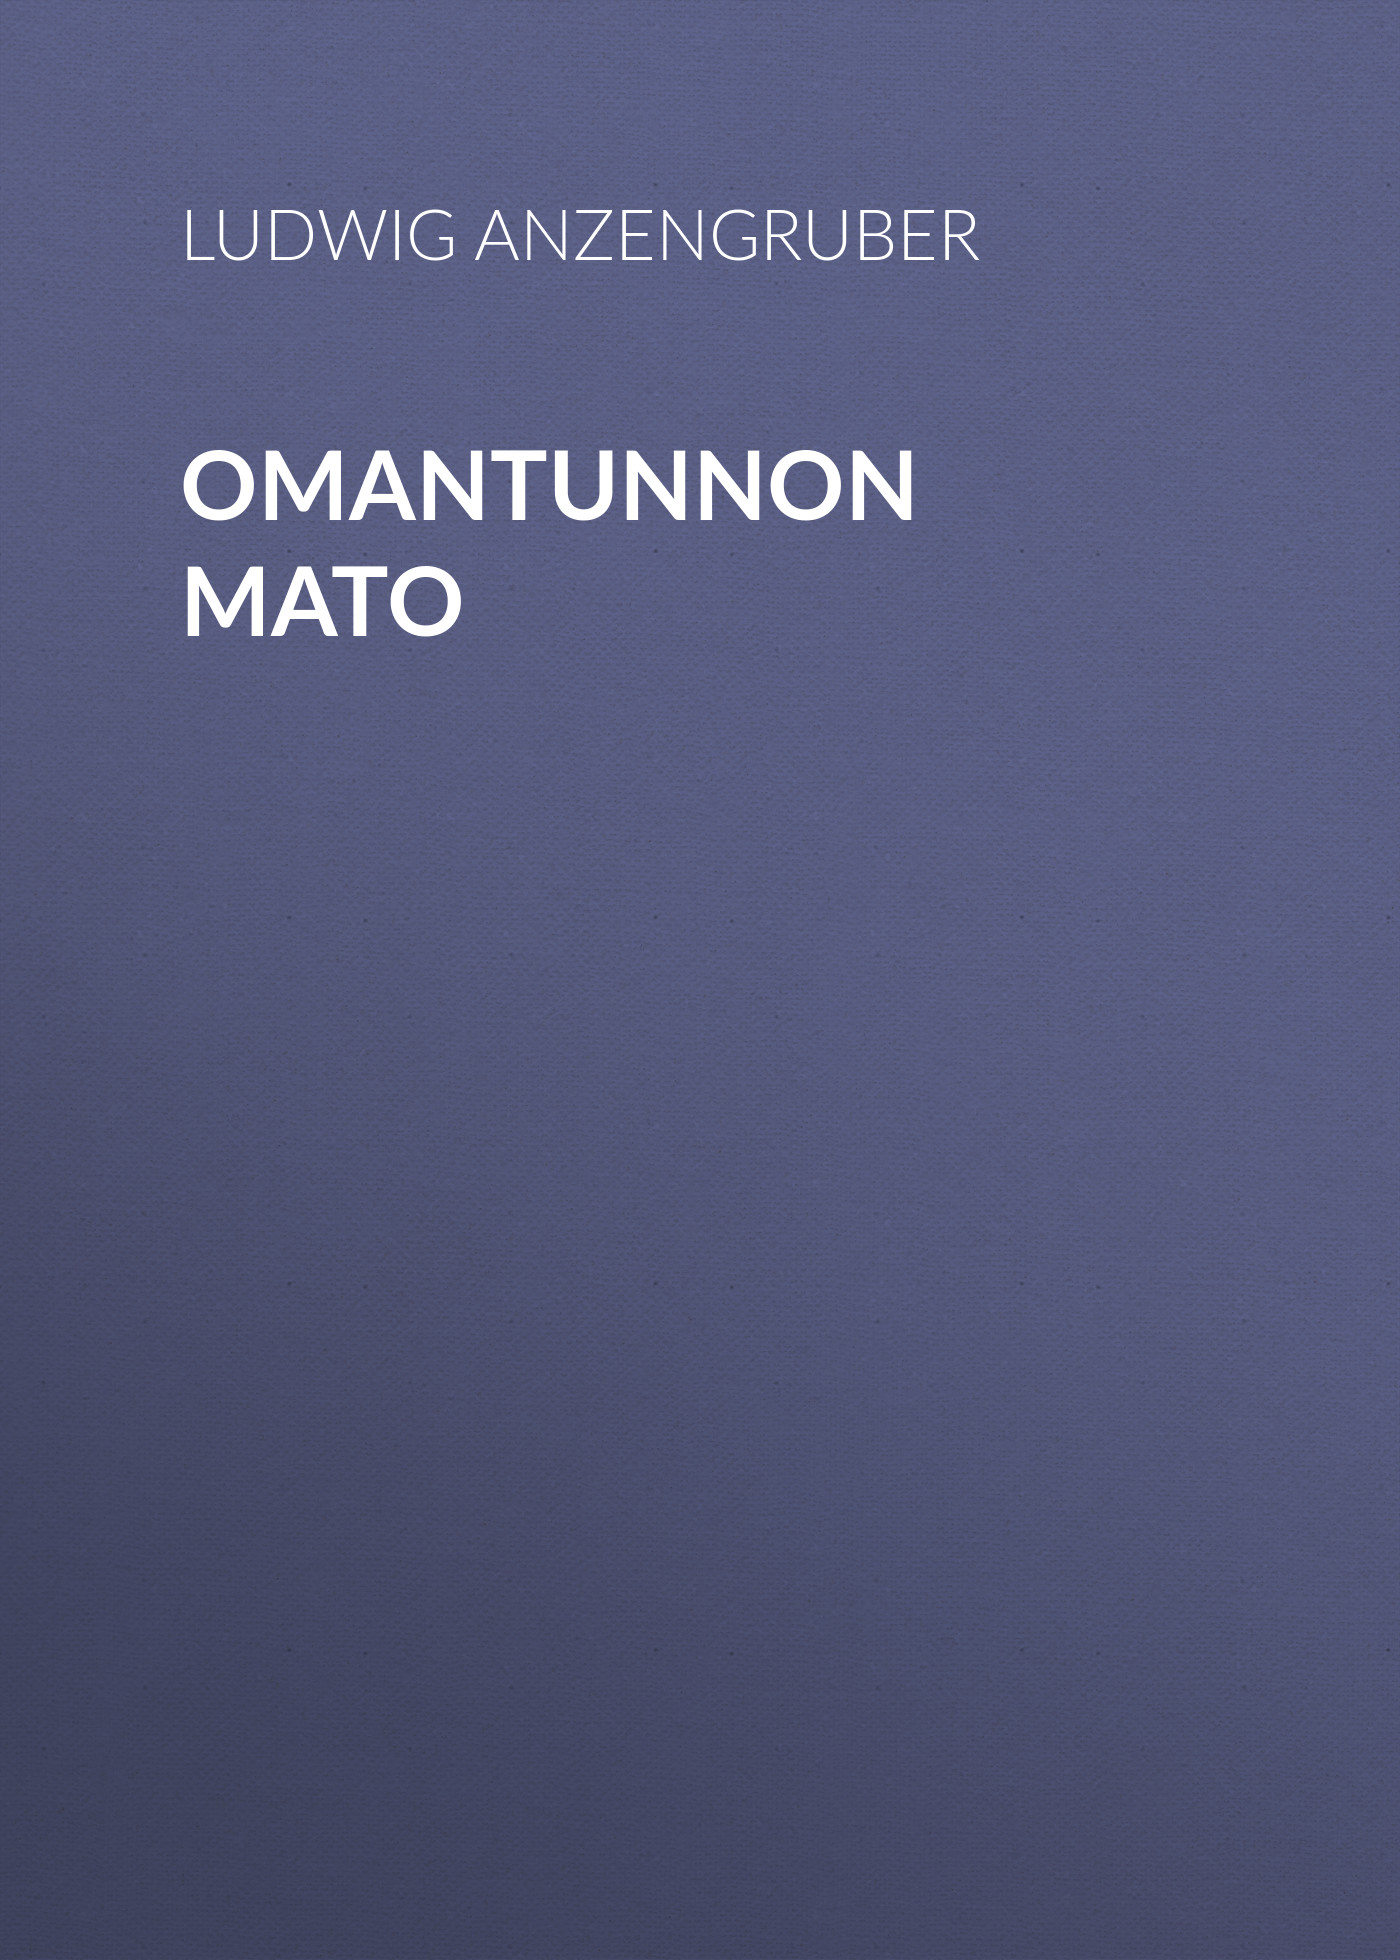 Anzengruber Ludwig Omantunnon mato